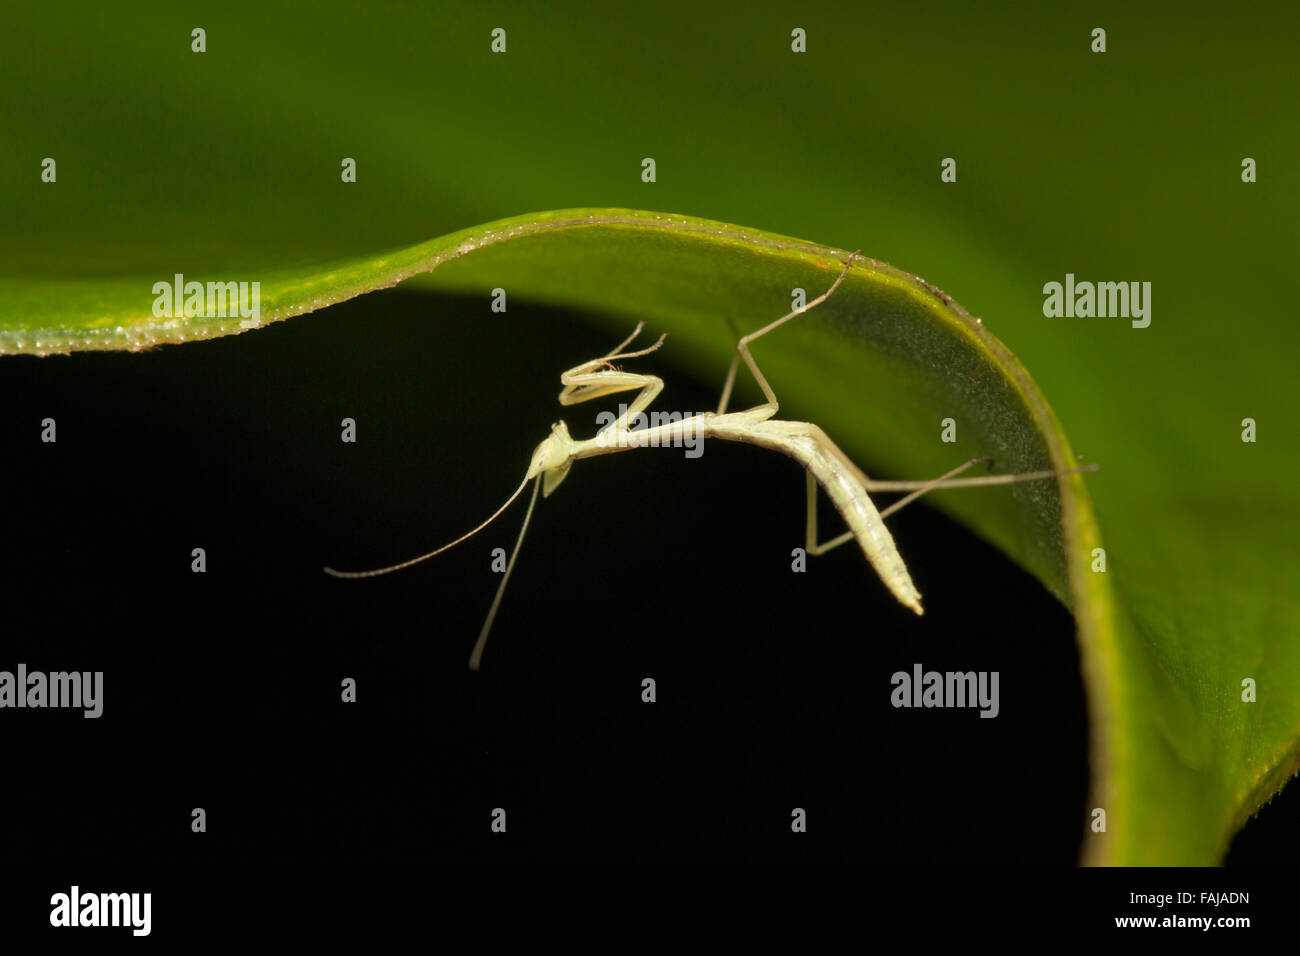 Mantis, Ordnung Mantodea, Aarey Milch Kolonie, Indien Stockbild